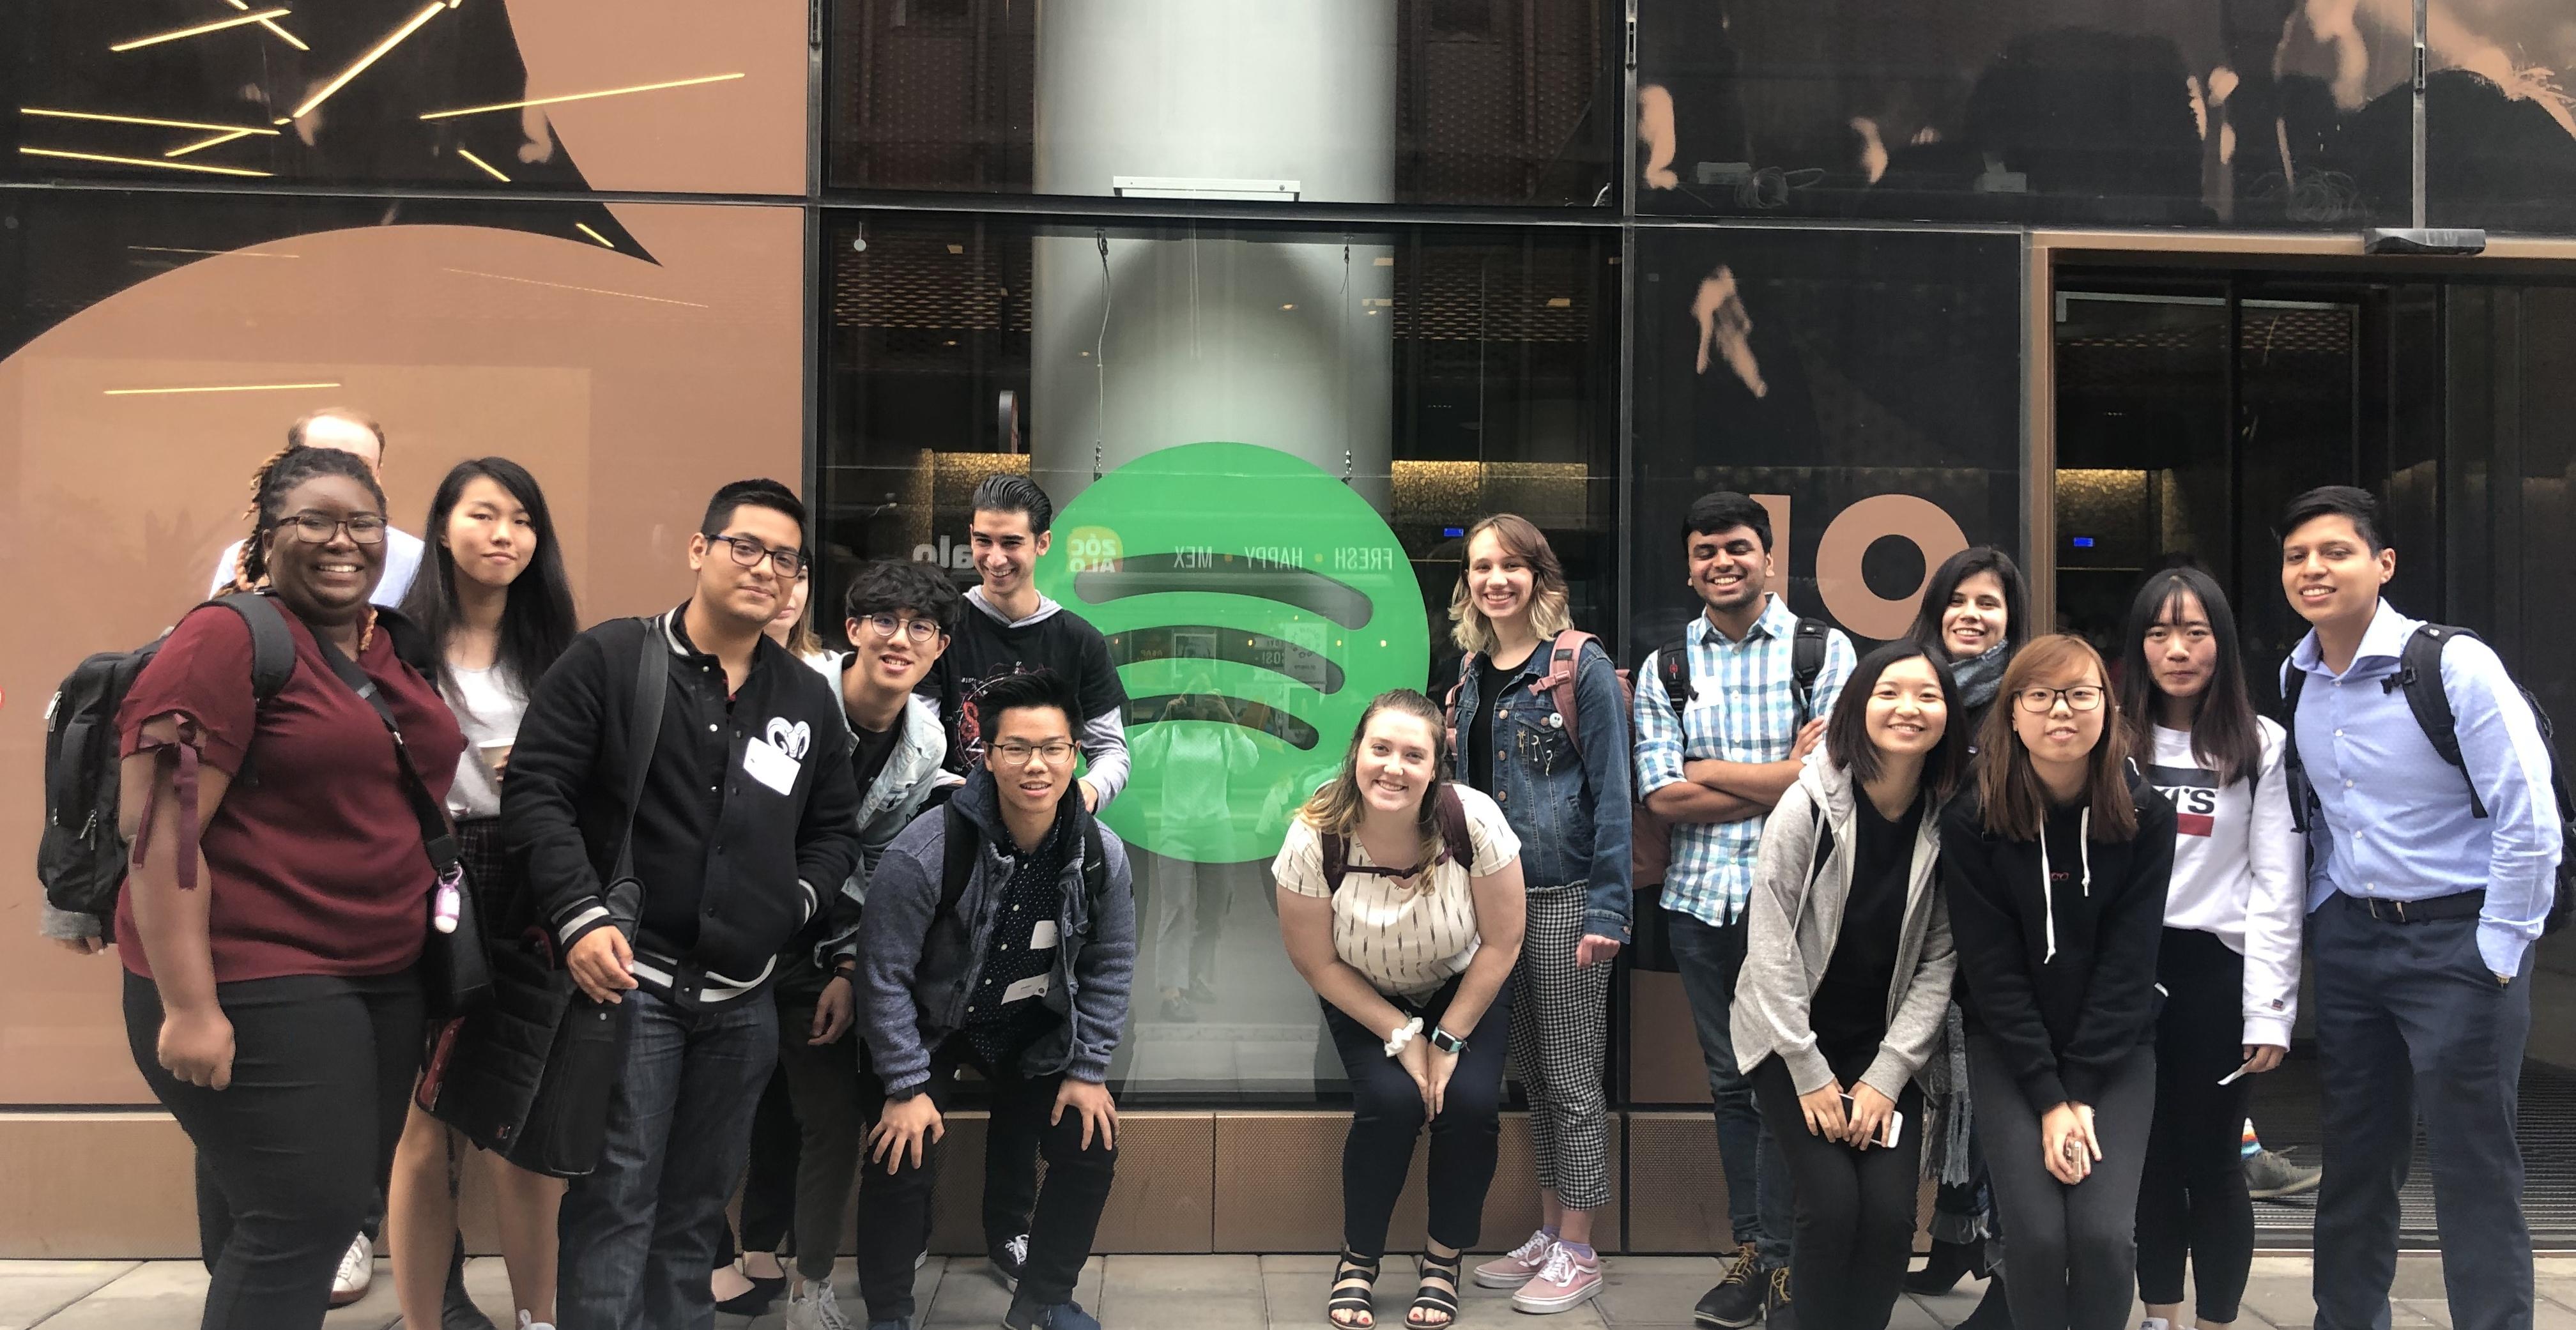 Spotify company visit in Stockholm